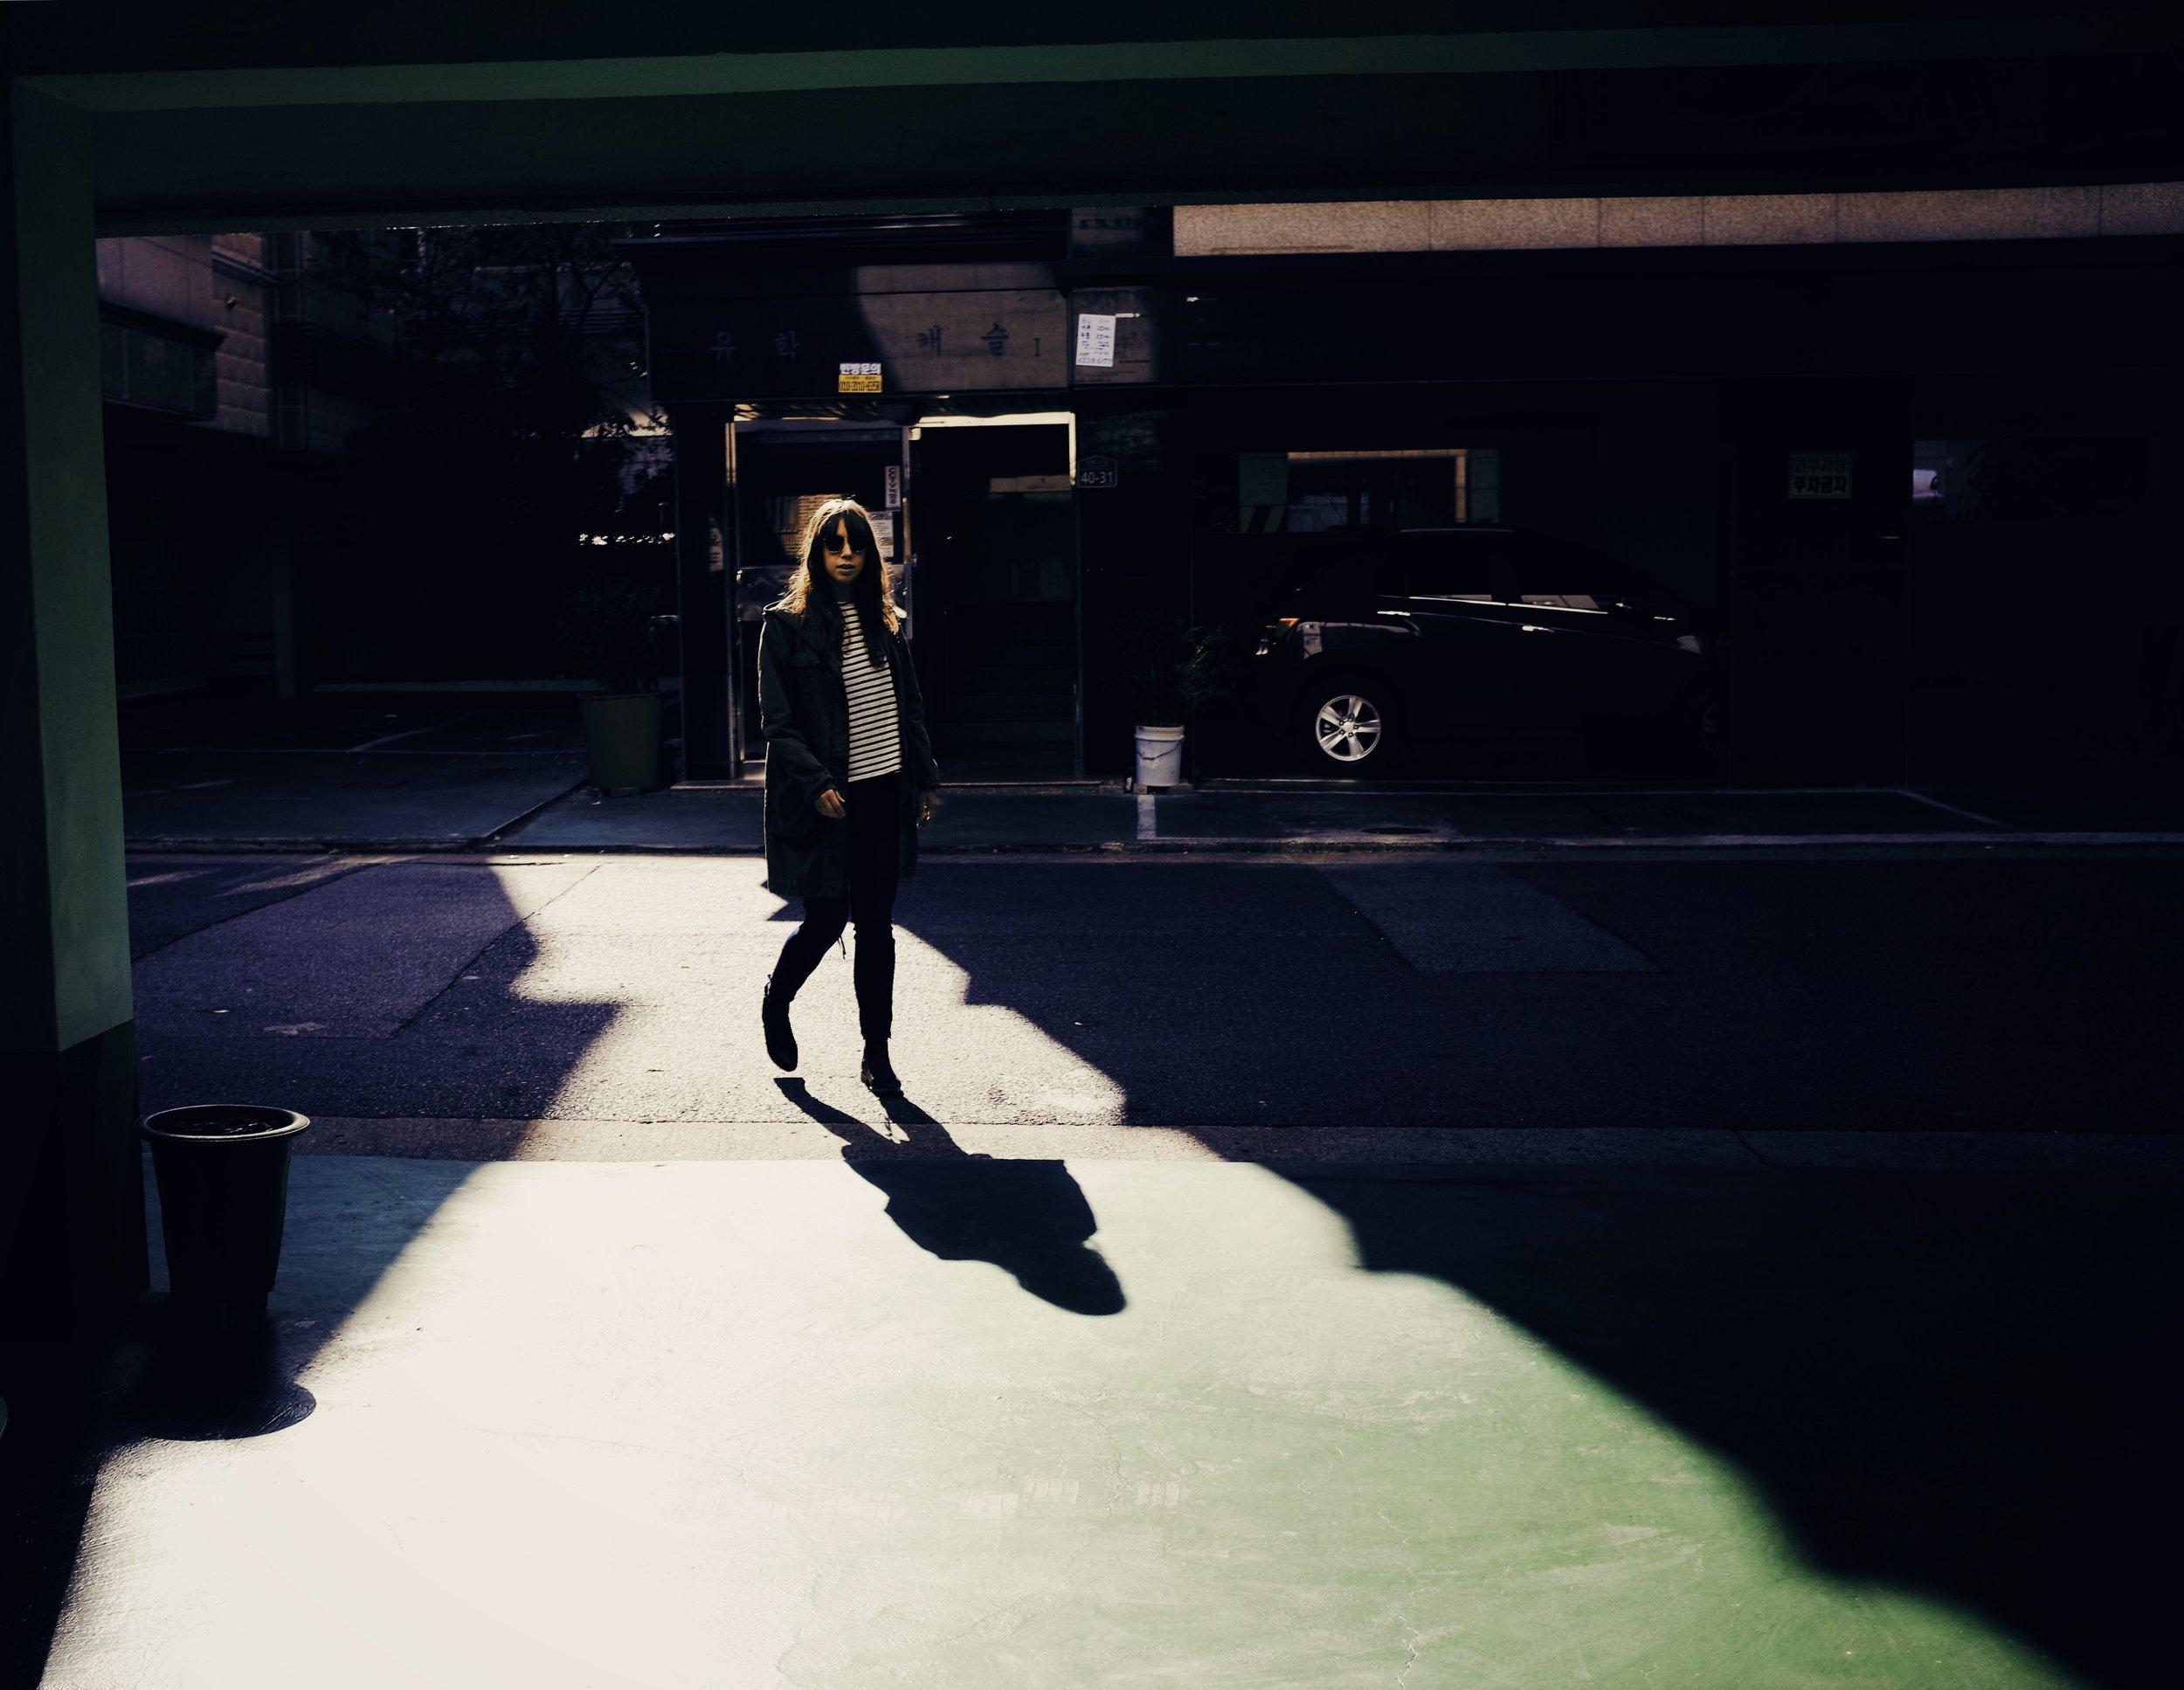 Parking shadows